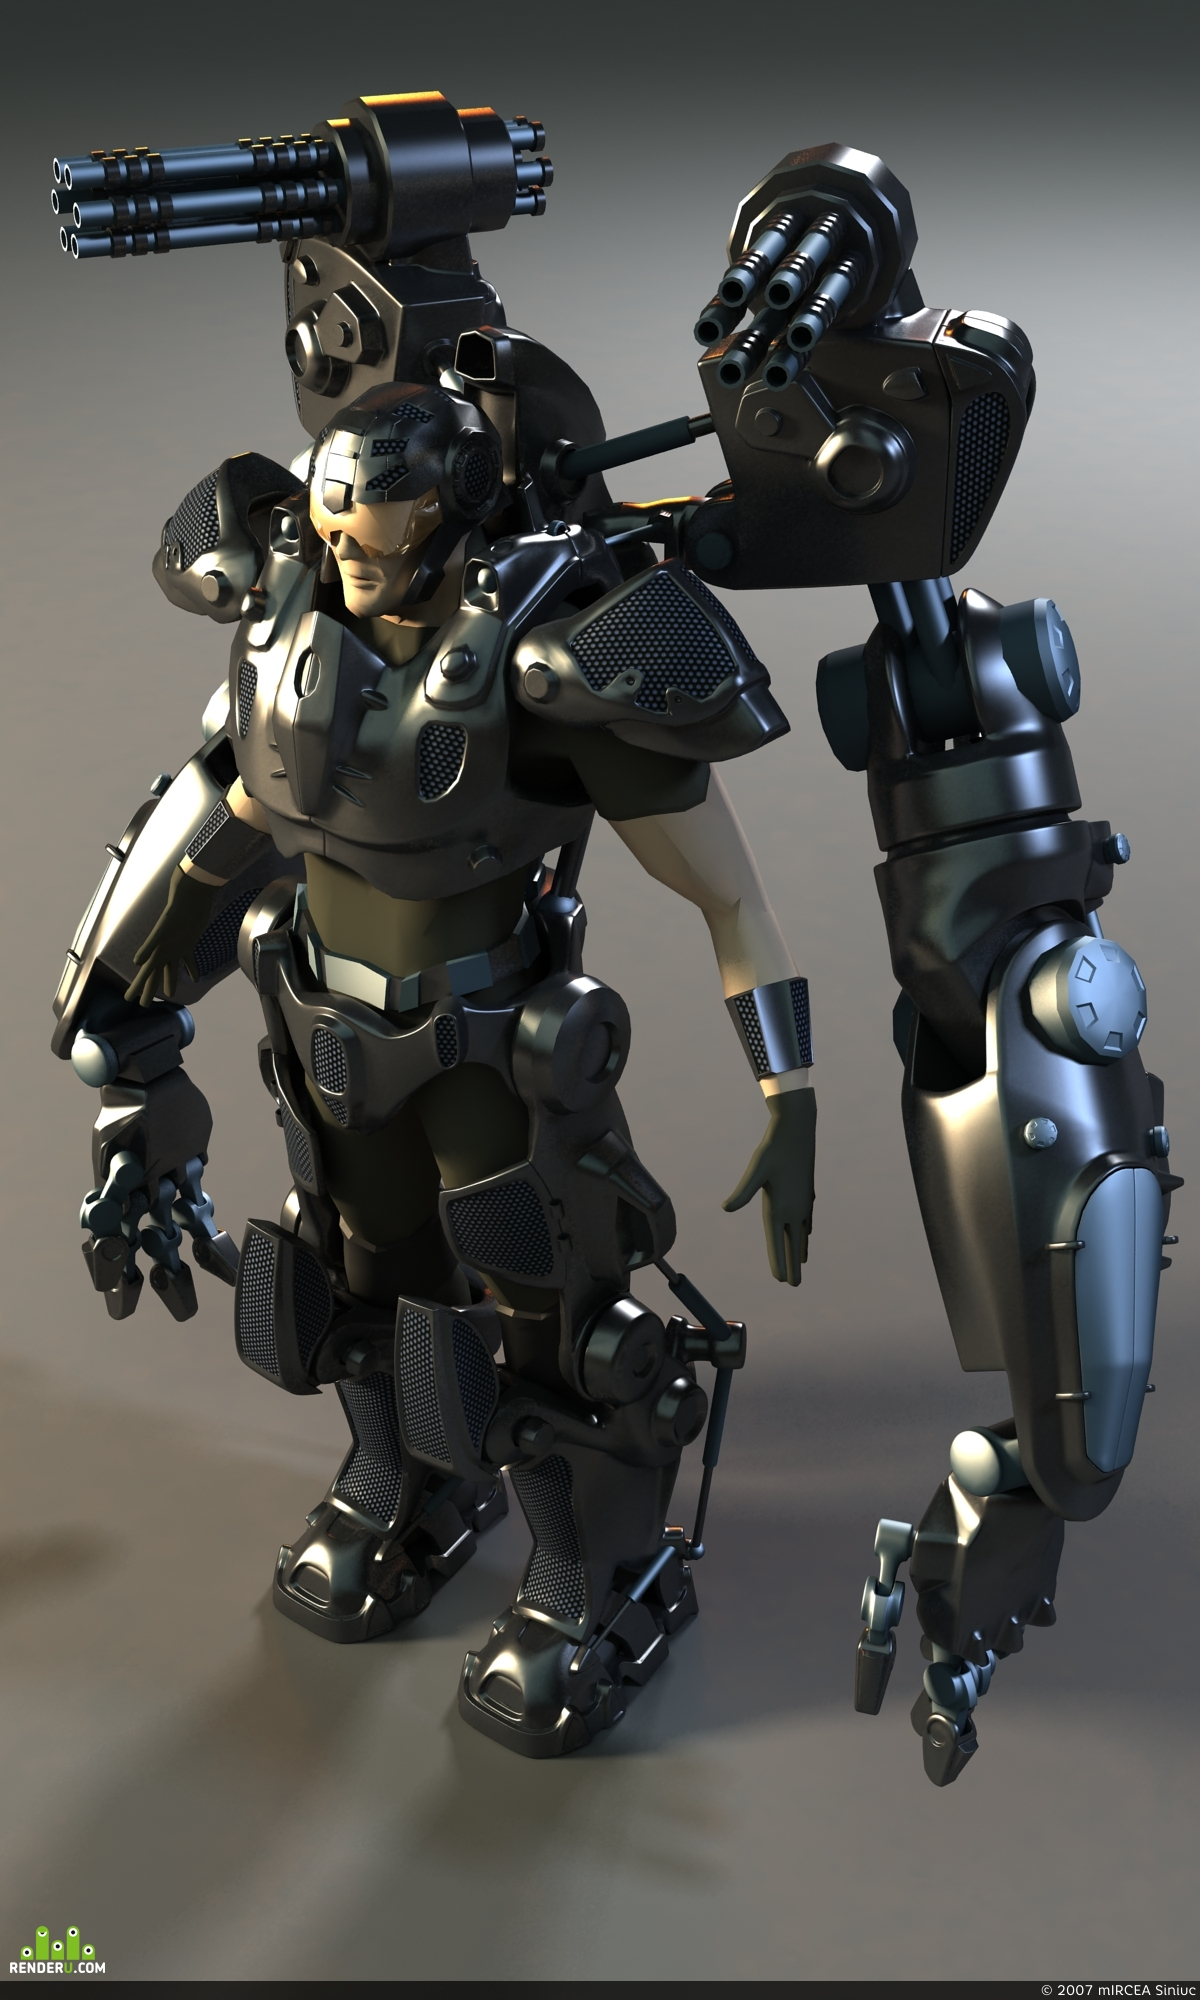 preview Robotizirovannii EXOSCHELET